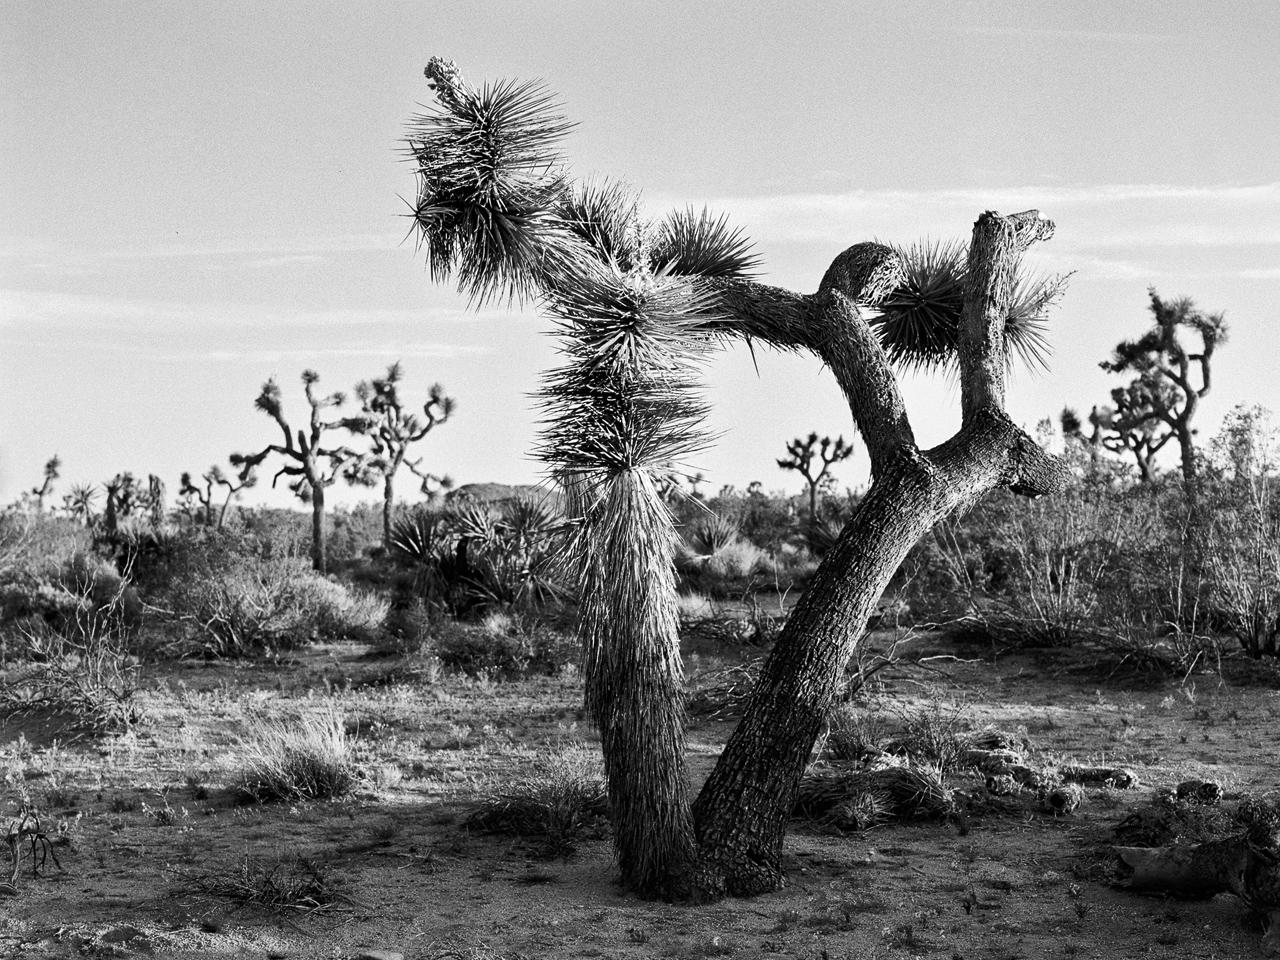 California_2016_Kodak_Tri-x_5_4.jpg